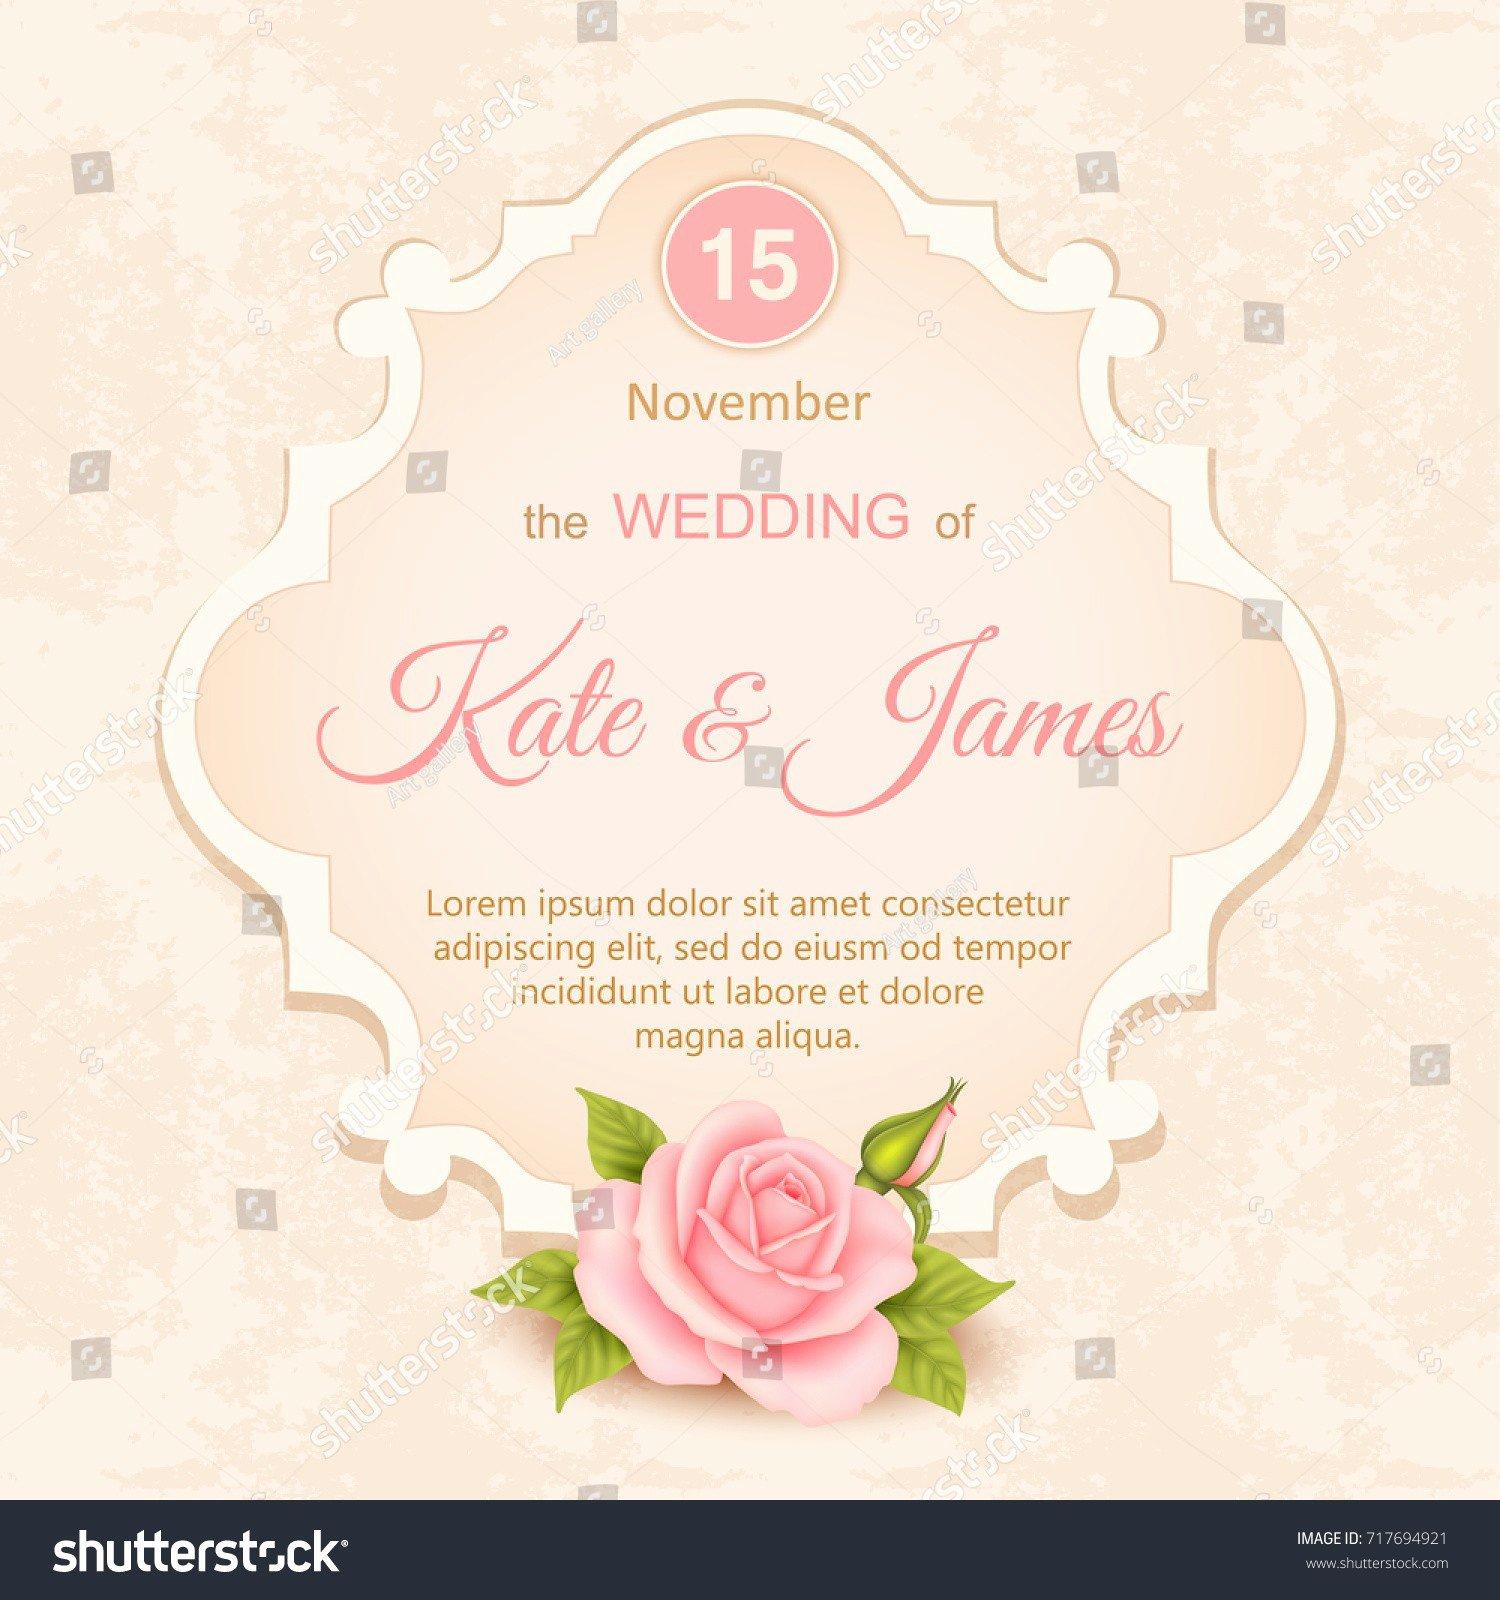 Wedding Anniversary Invitation Template Beautiful 60th Wedding Anniversary Invitations Templates